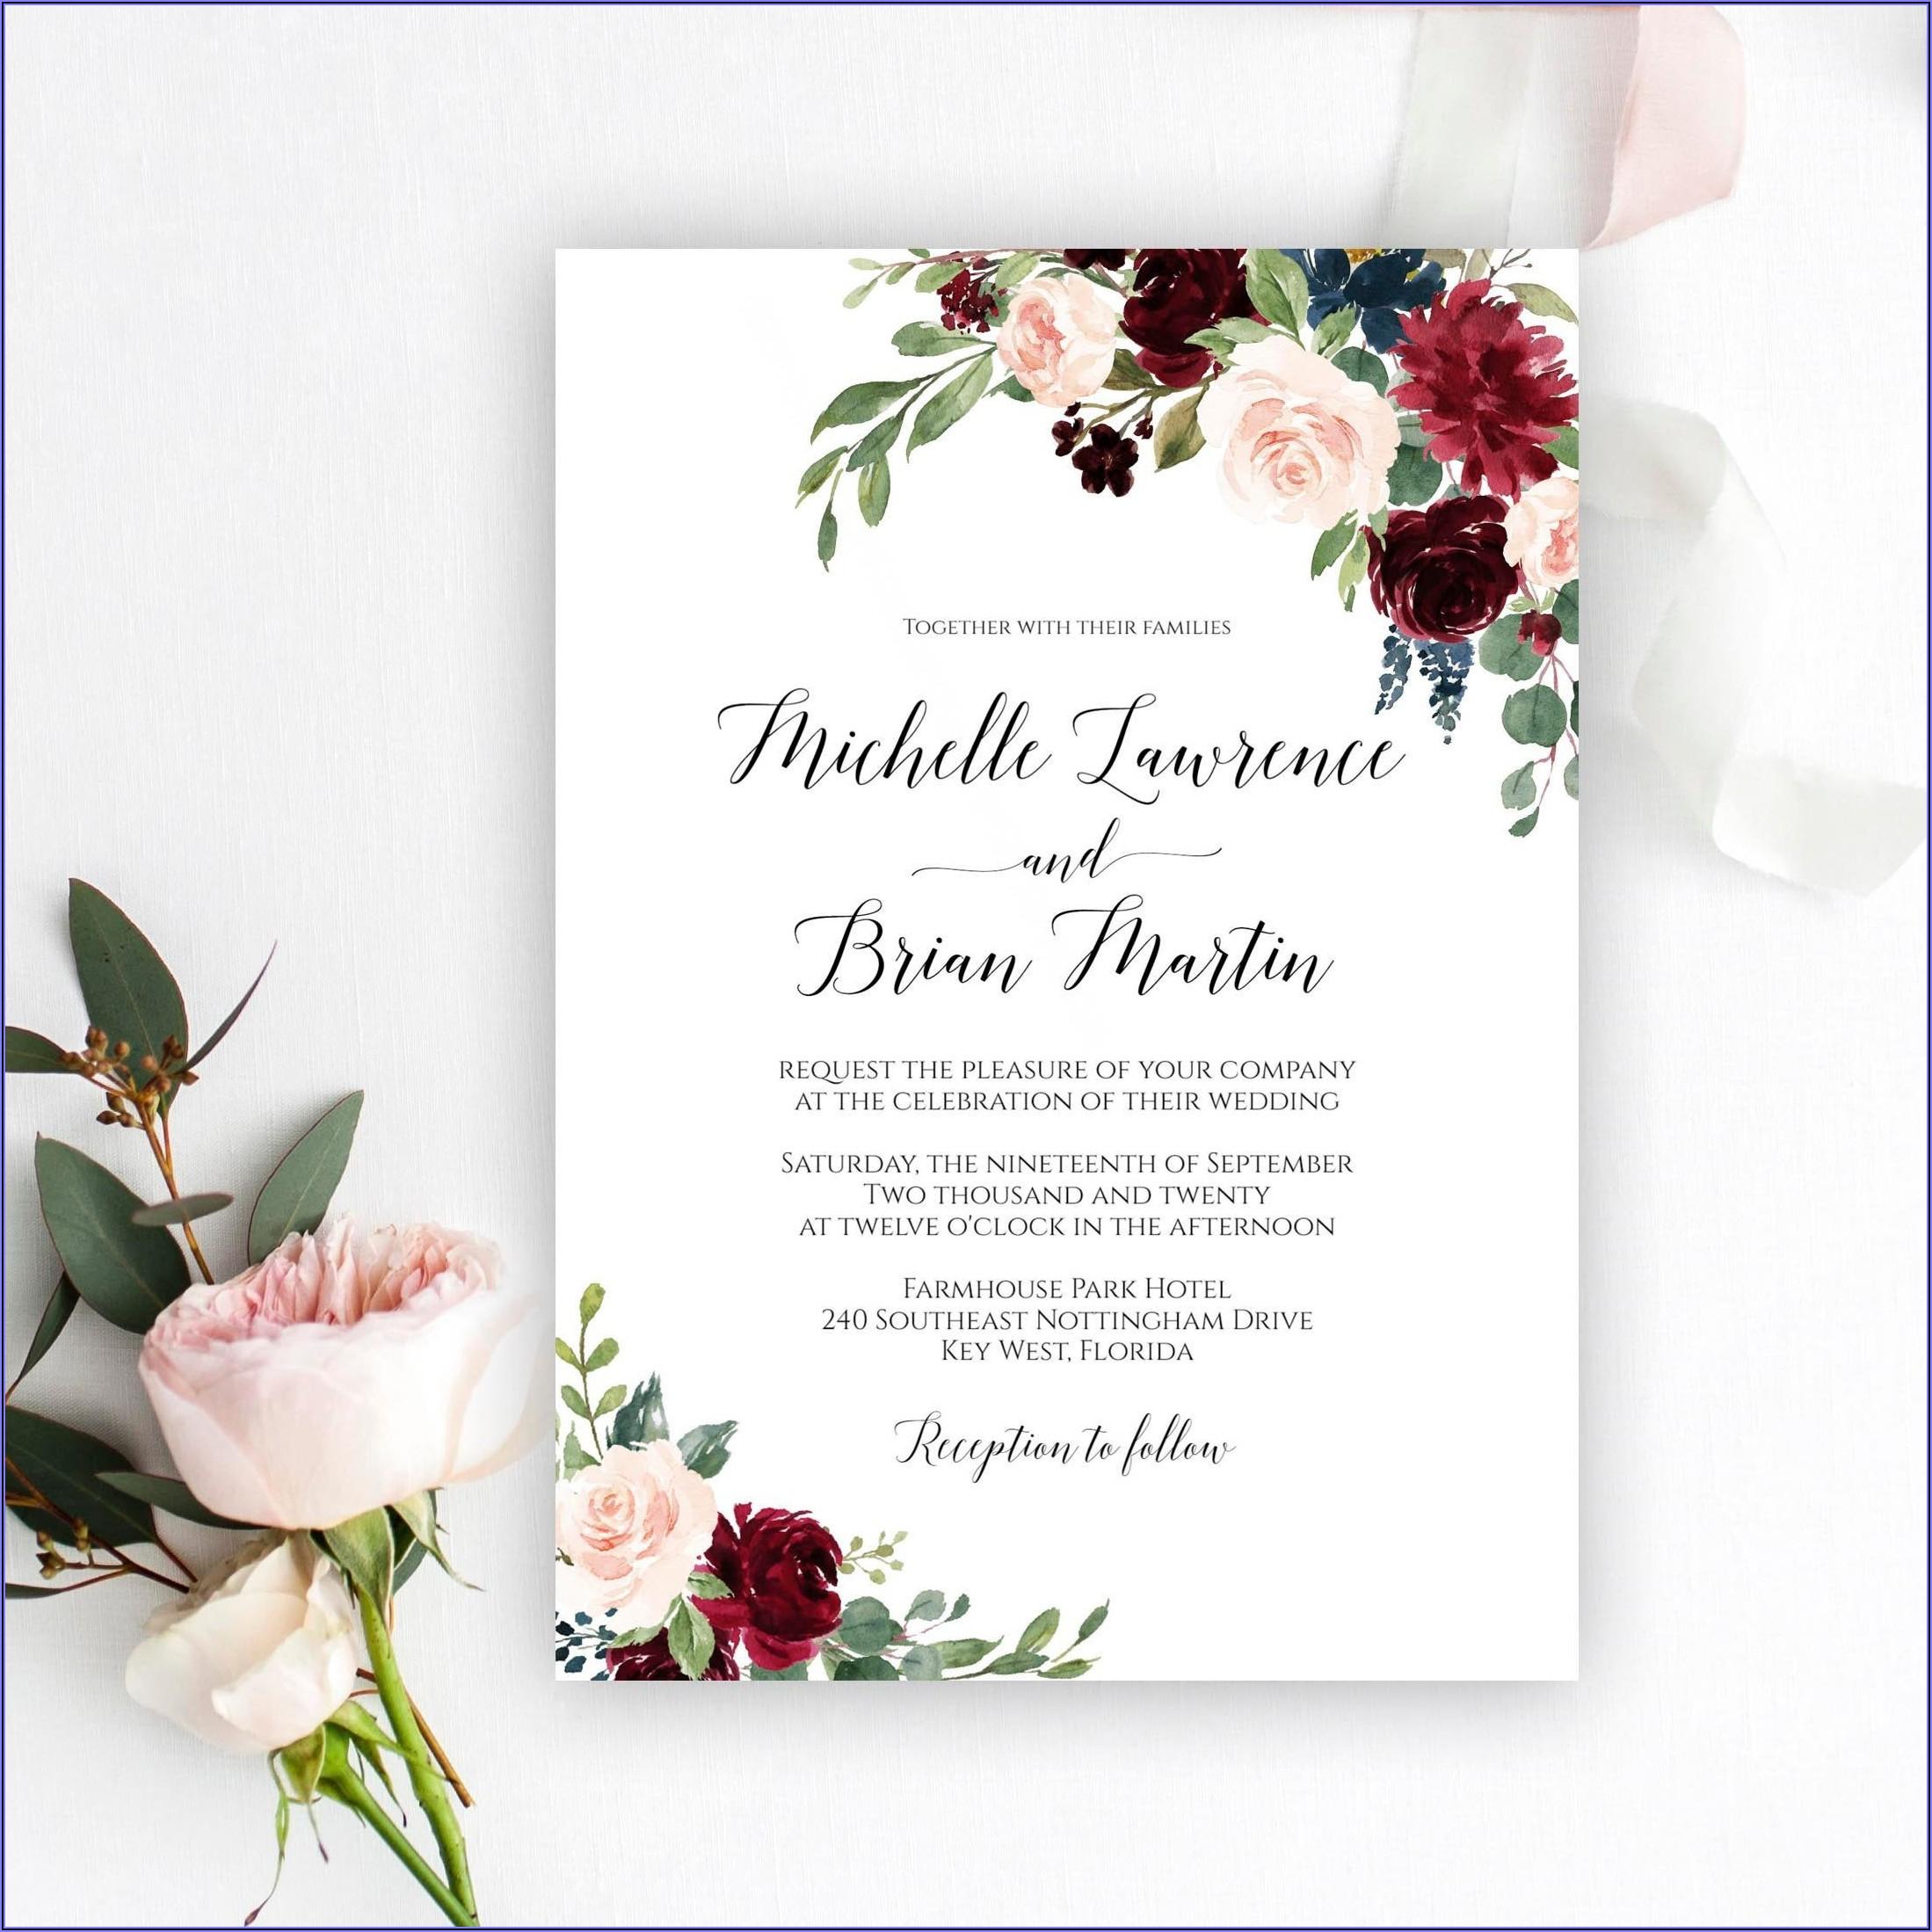 Wedding Invitation Card Templates Free Download